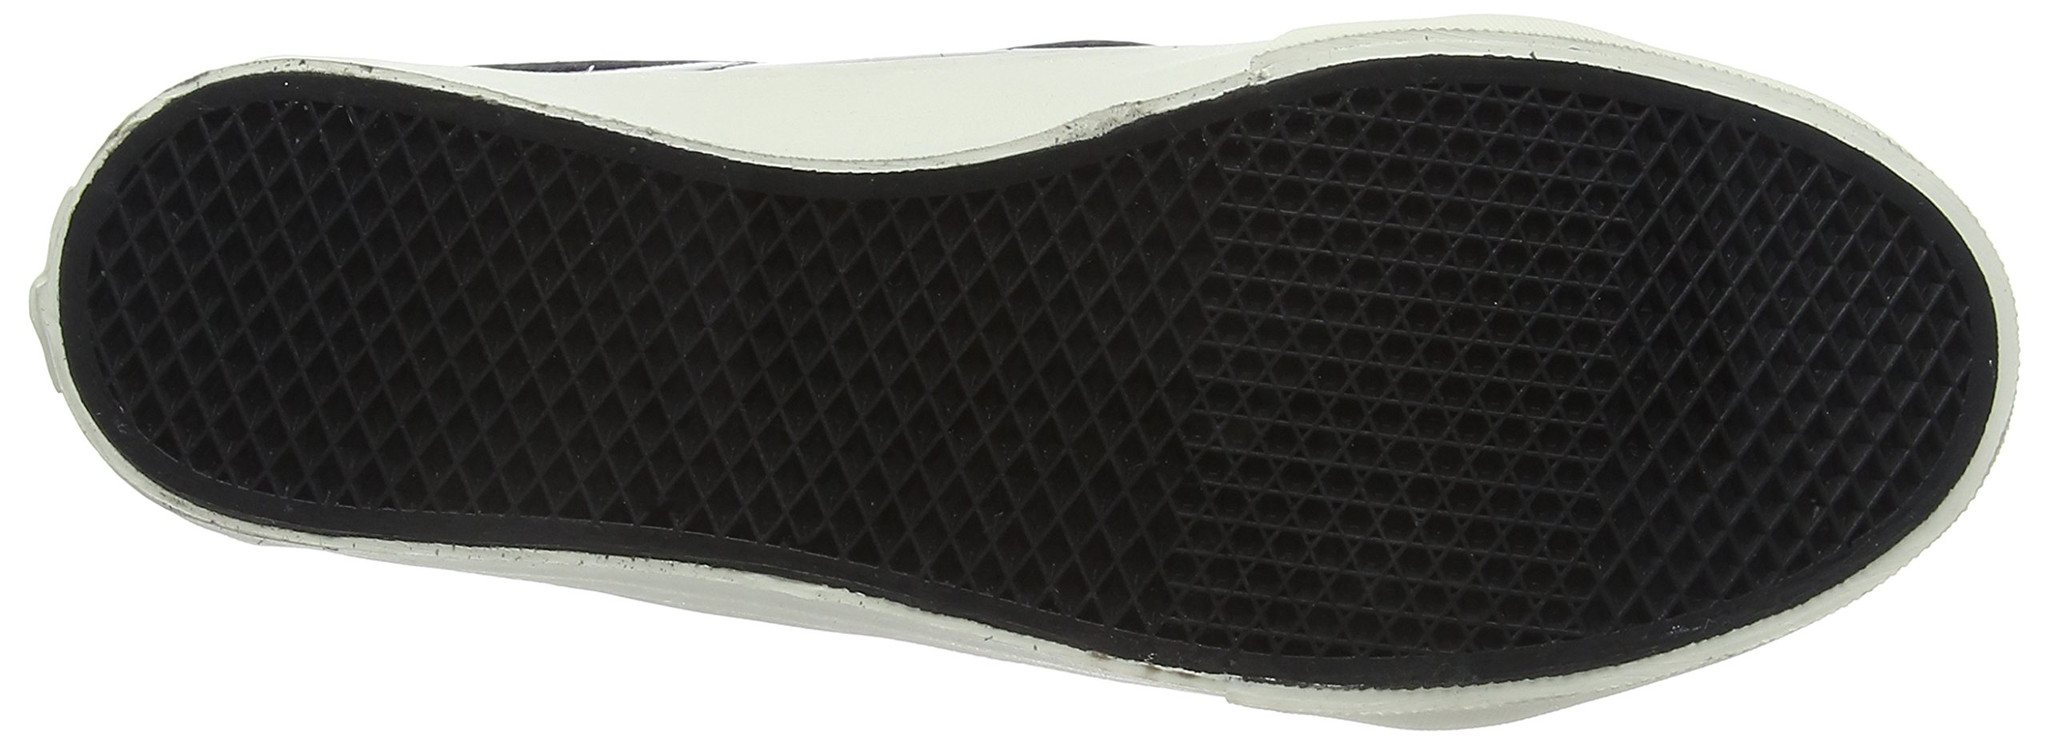 Vans Sk8-Hi Slim Zip Croc Leather Black 10M High-Top Skateboarding Shoe - 10M Black / 8.5M 21ea65